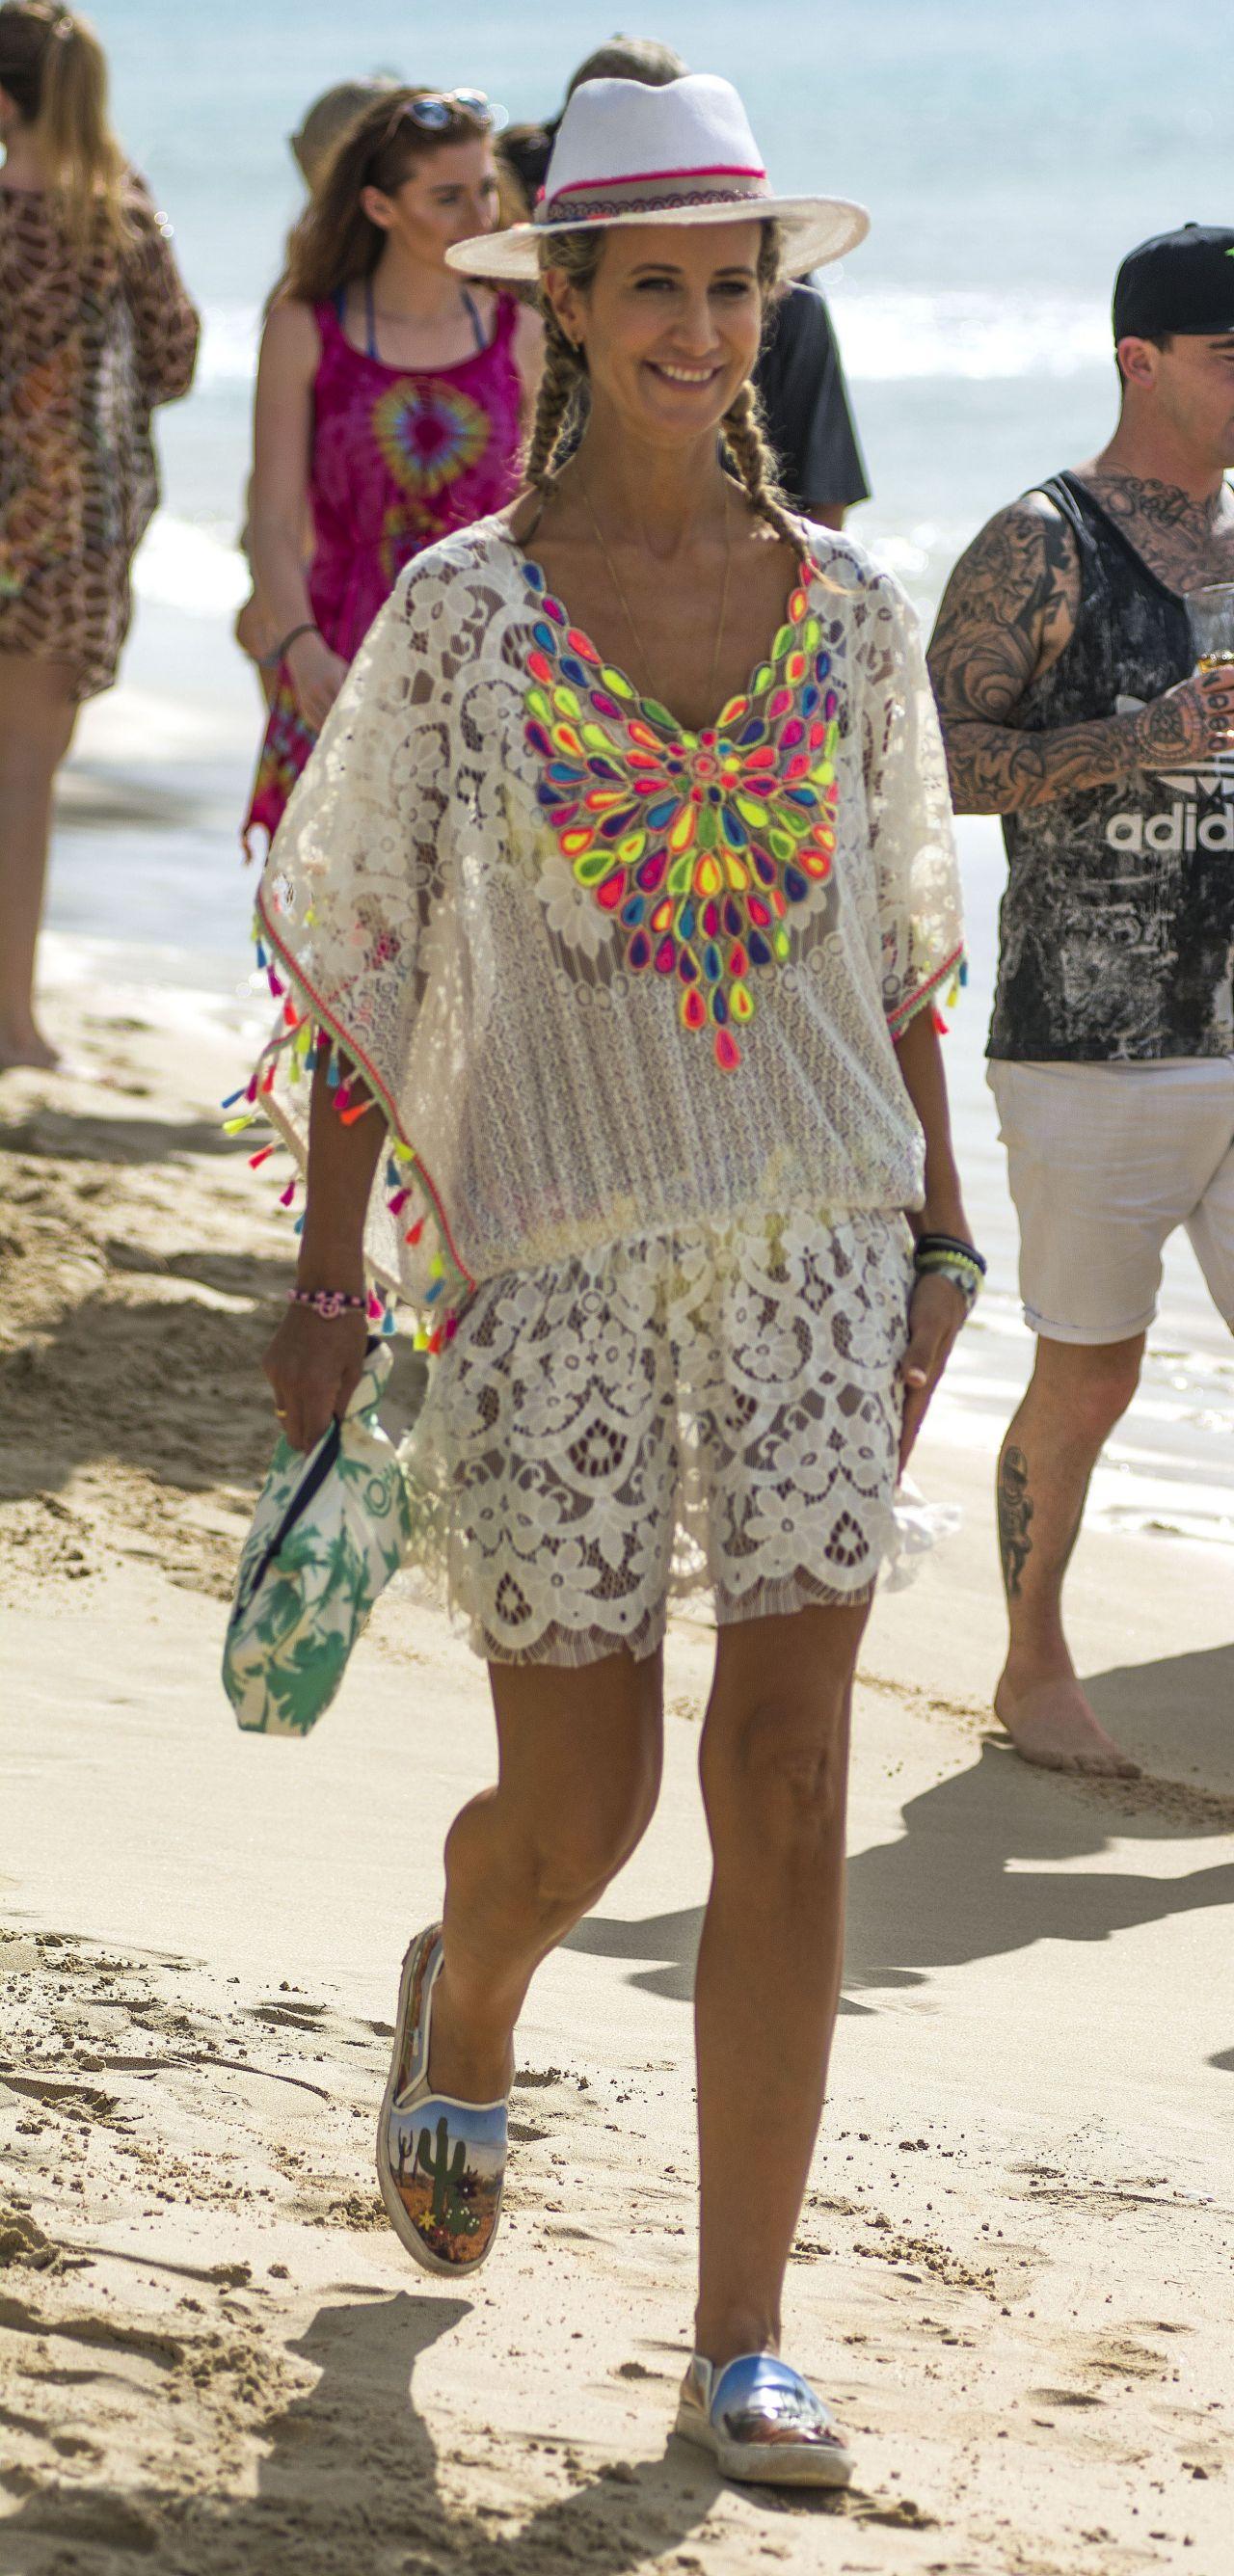 Lady Victoria Hervey in Bikini Boat Party in Barbados Pic 33 of 35